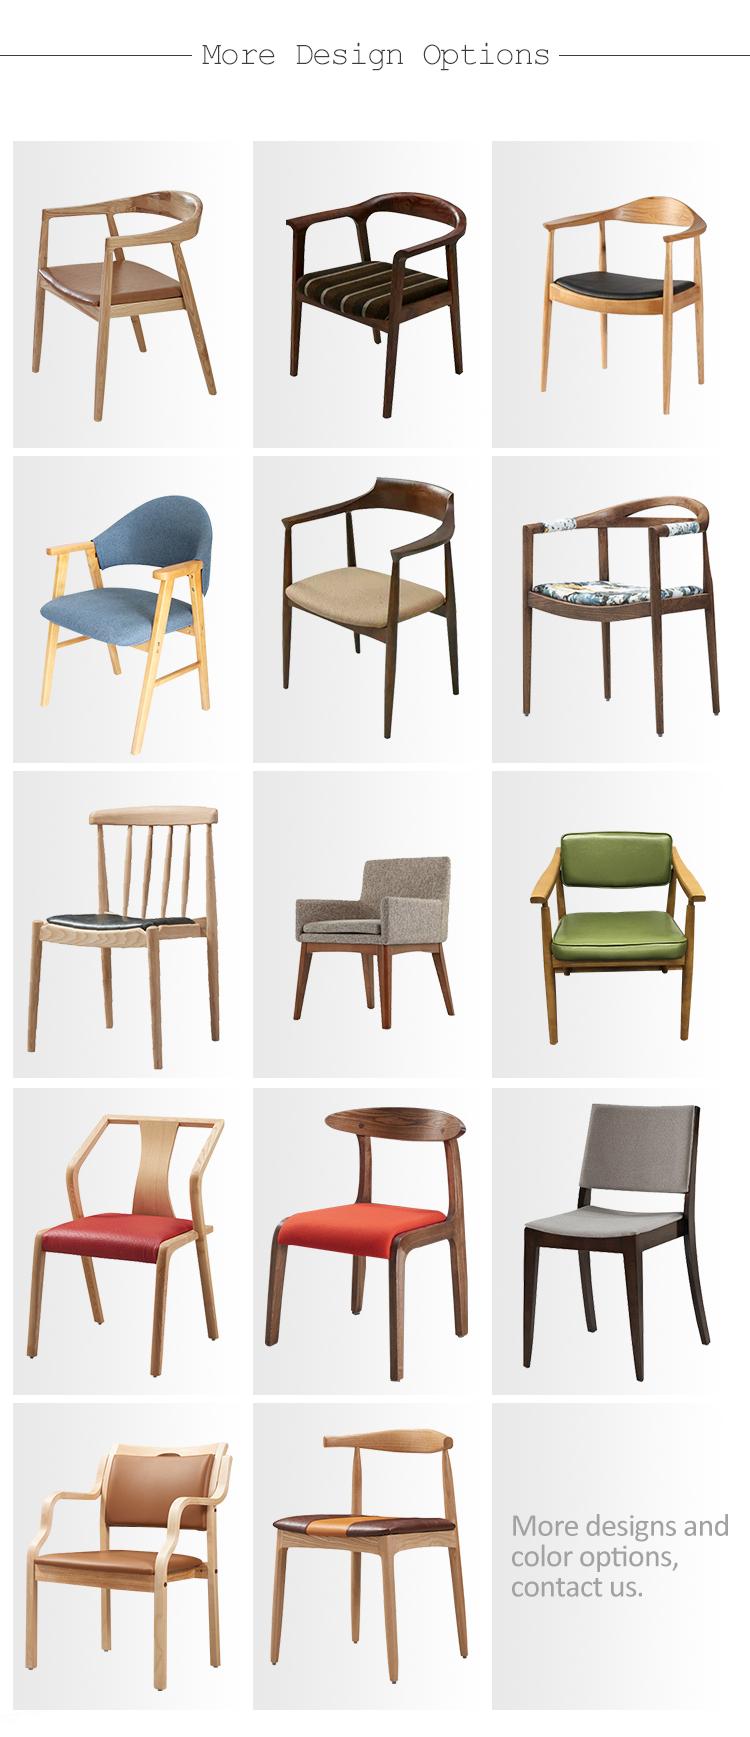 5-solid wood chair.jpg